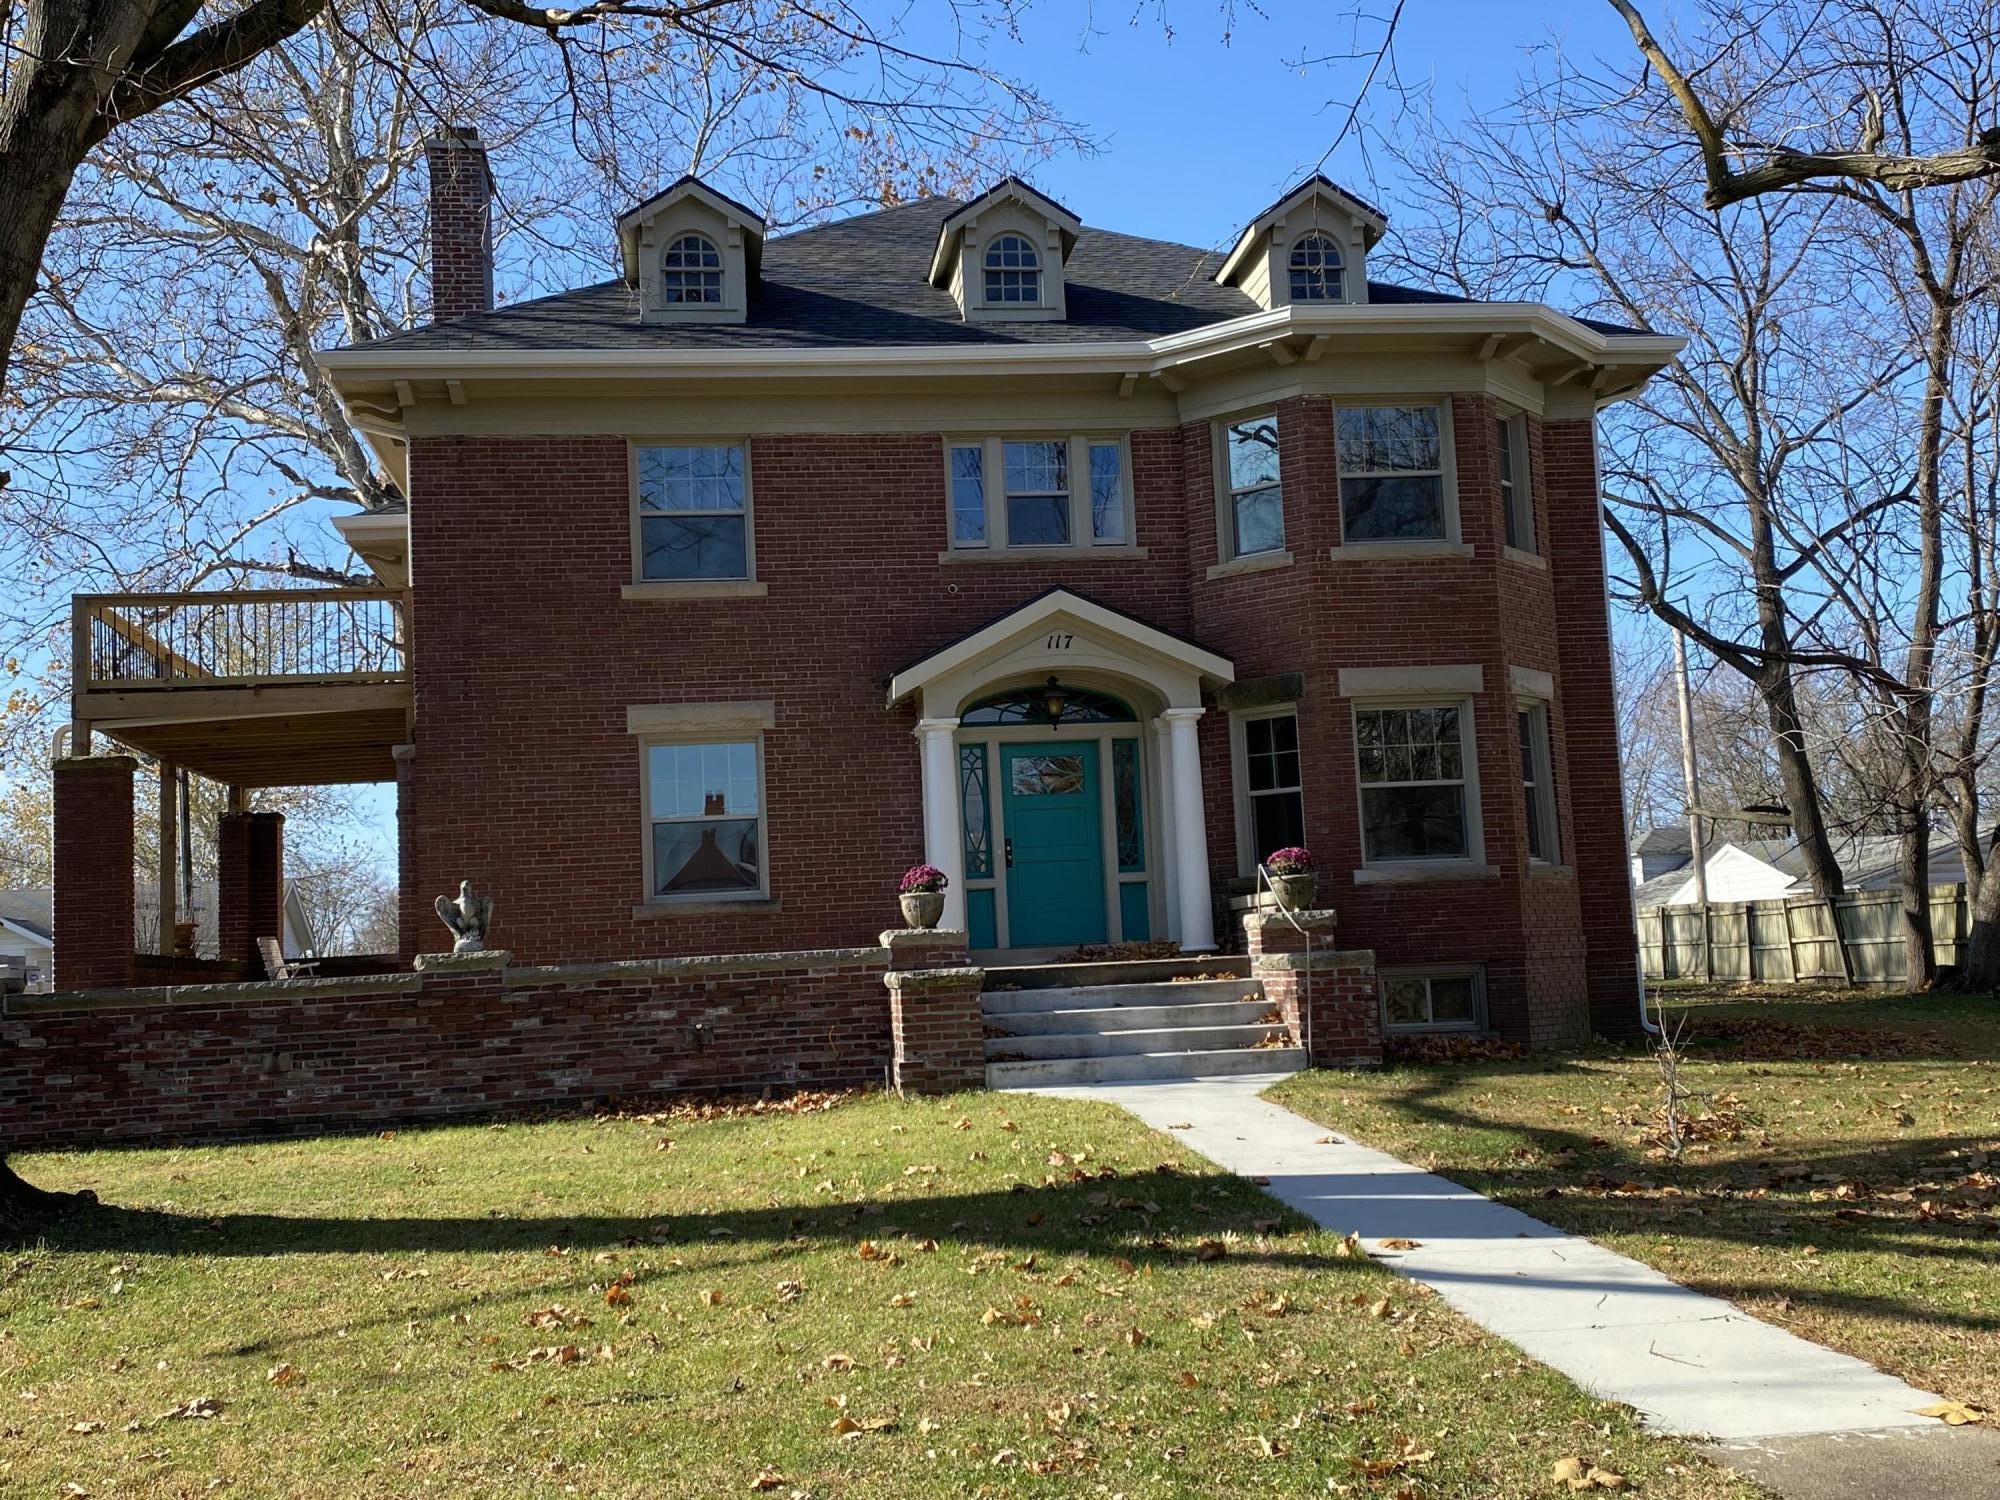 Residential for sale – 117  Monroe   Carrollton, MO